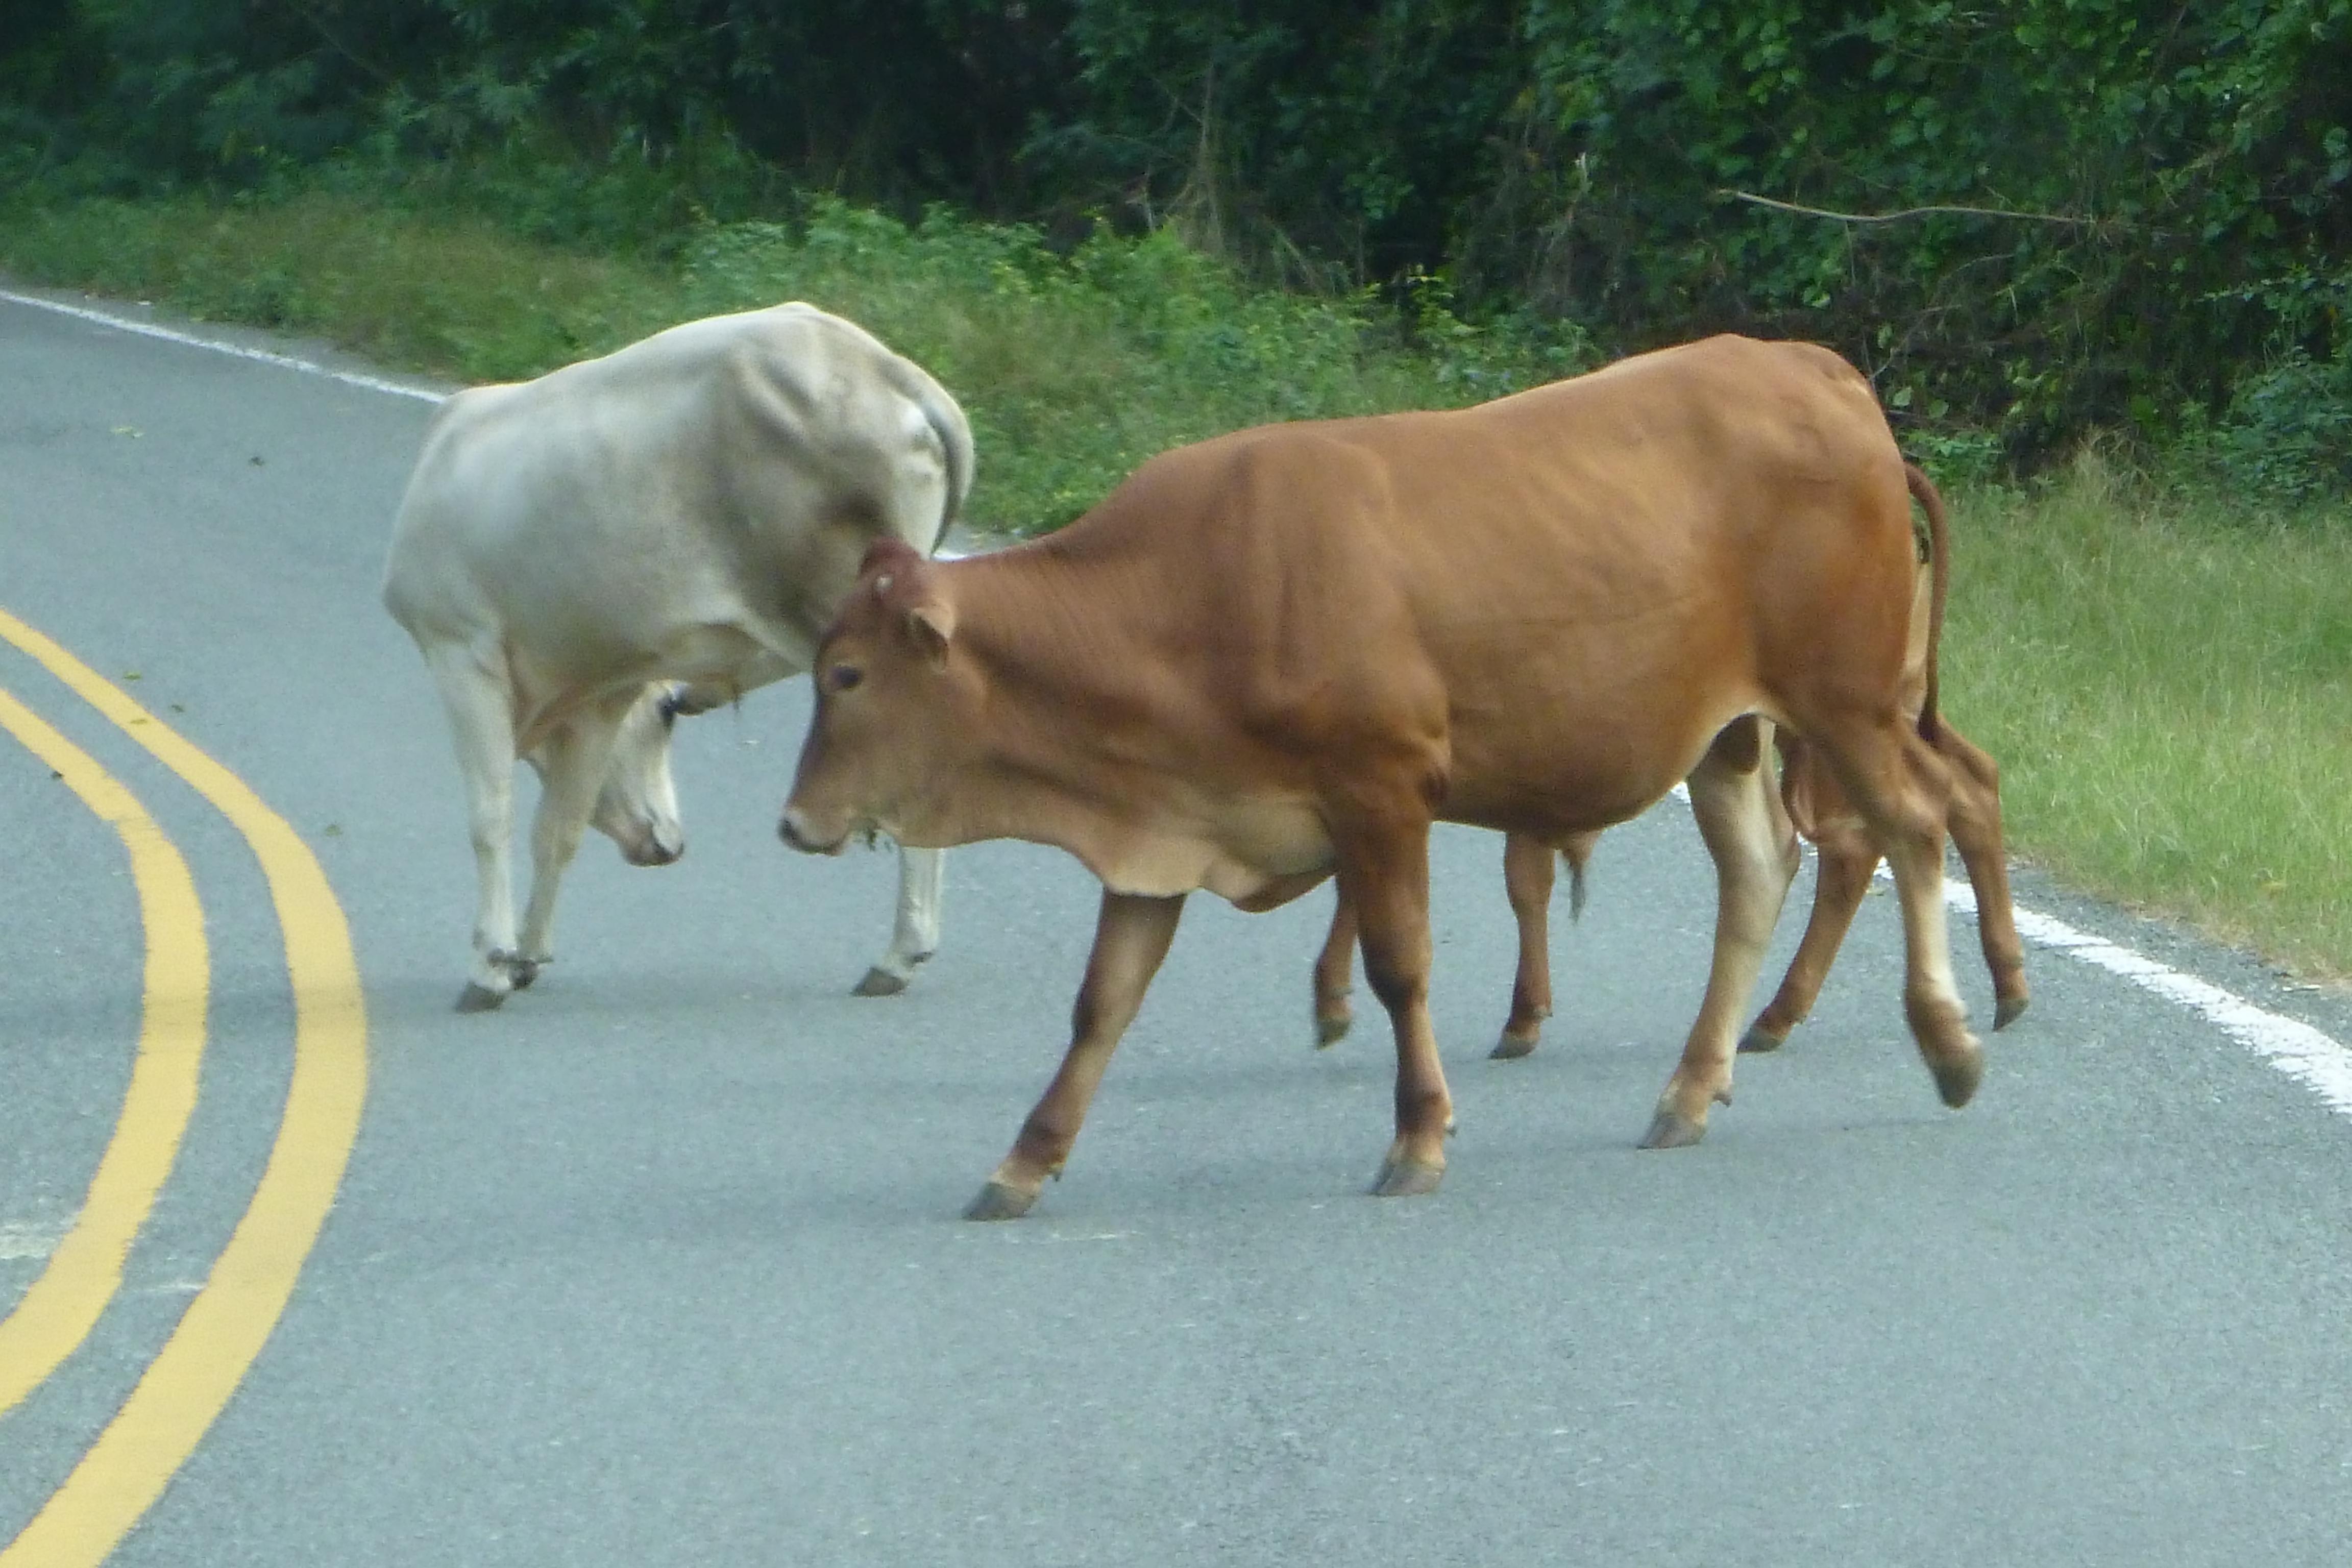 Cows crossing road in Vieques, Puerto Rico